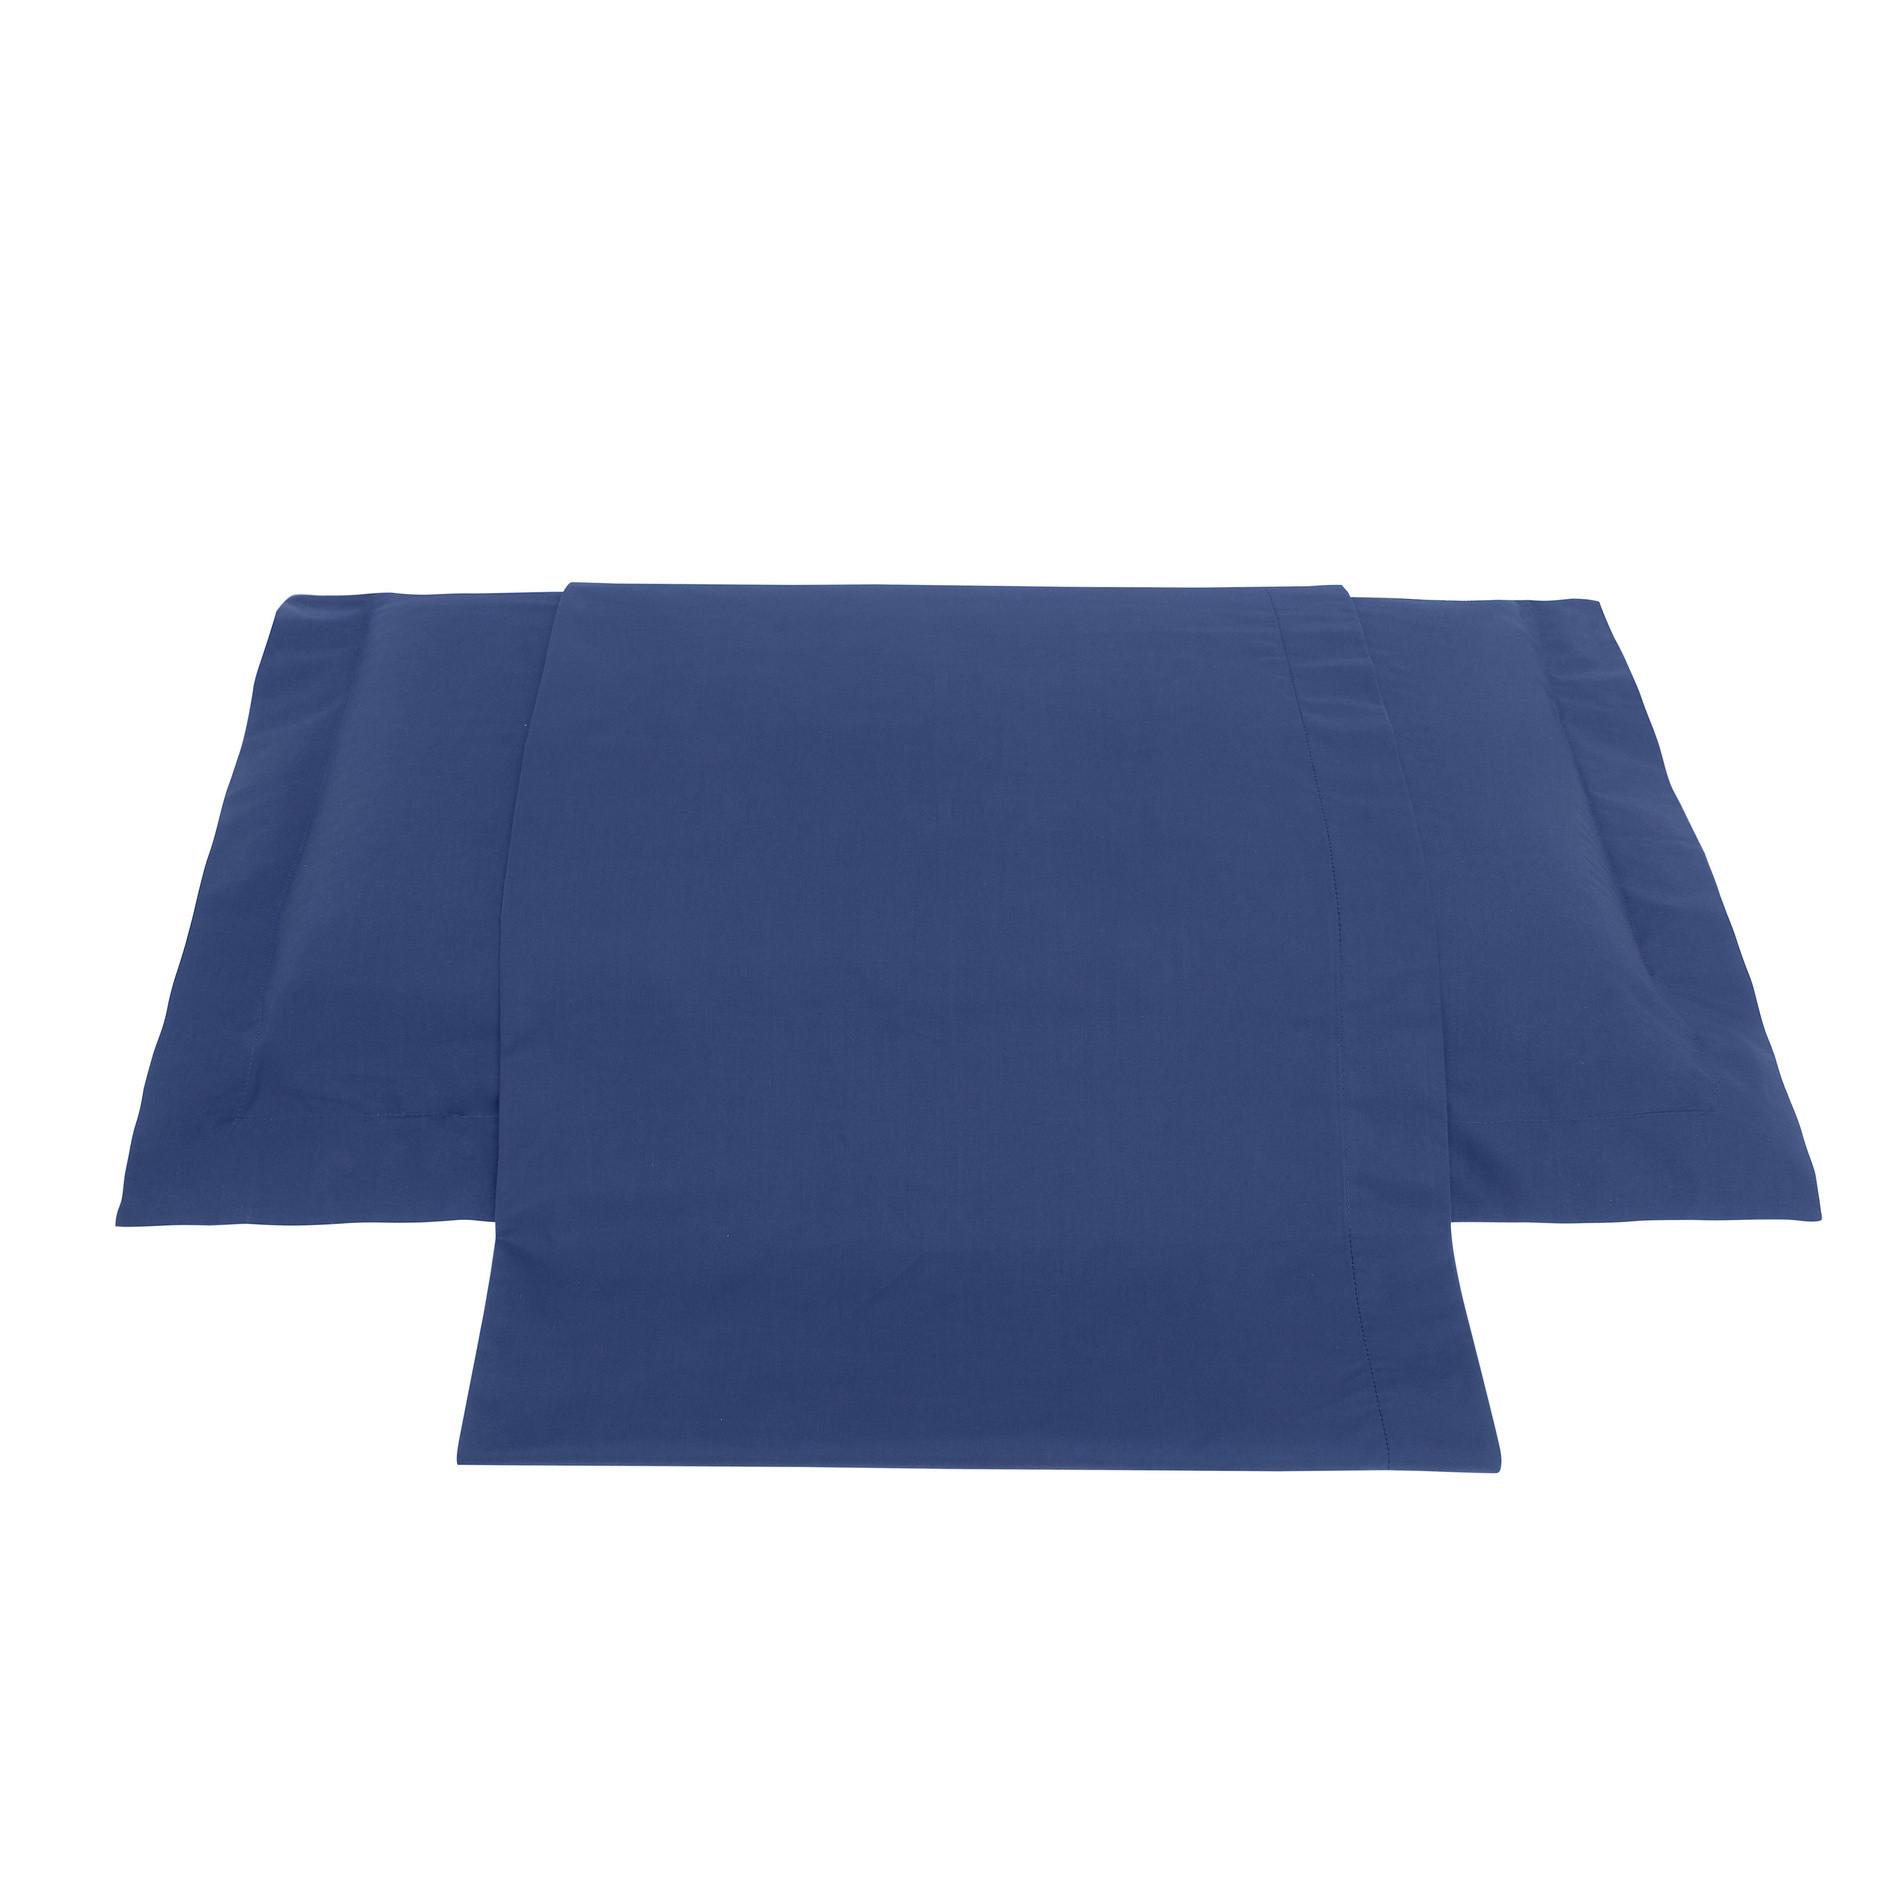 Lenzuolo liscio in percalle tinta unita Zefiro, Blu, large image number 0